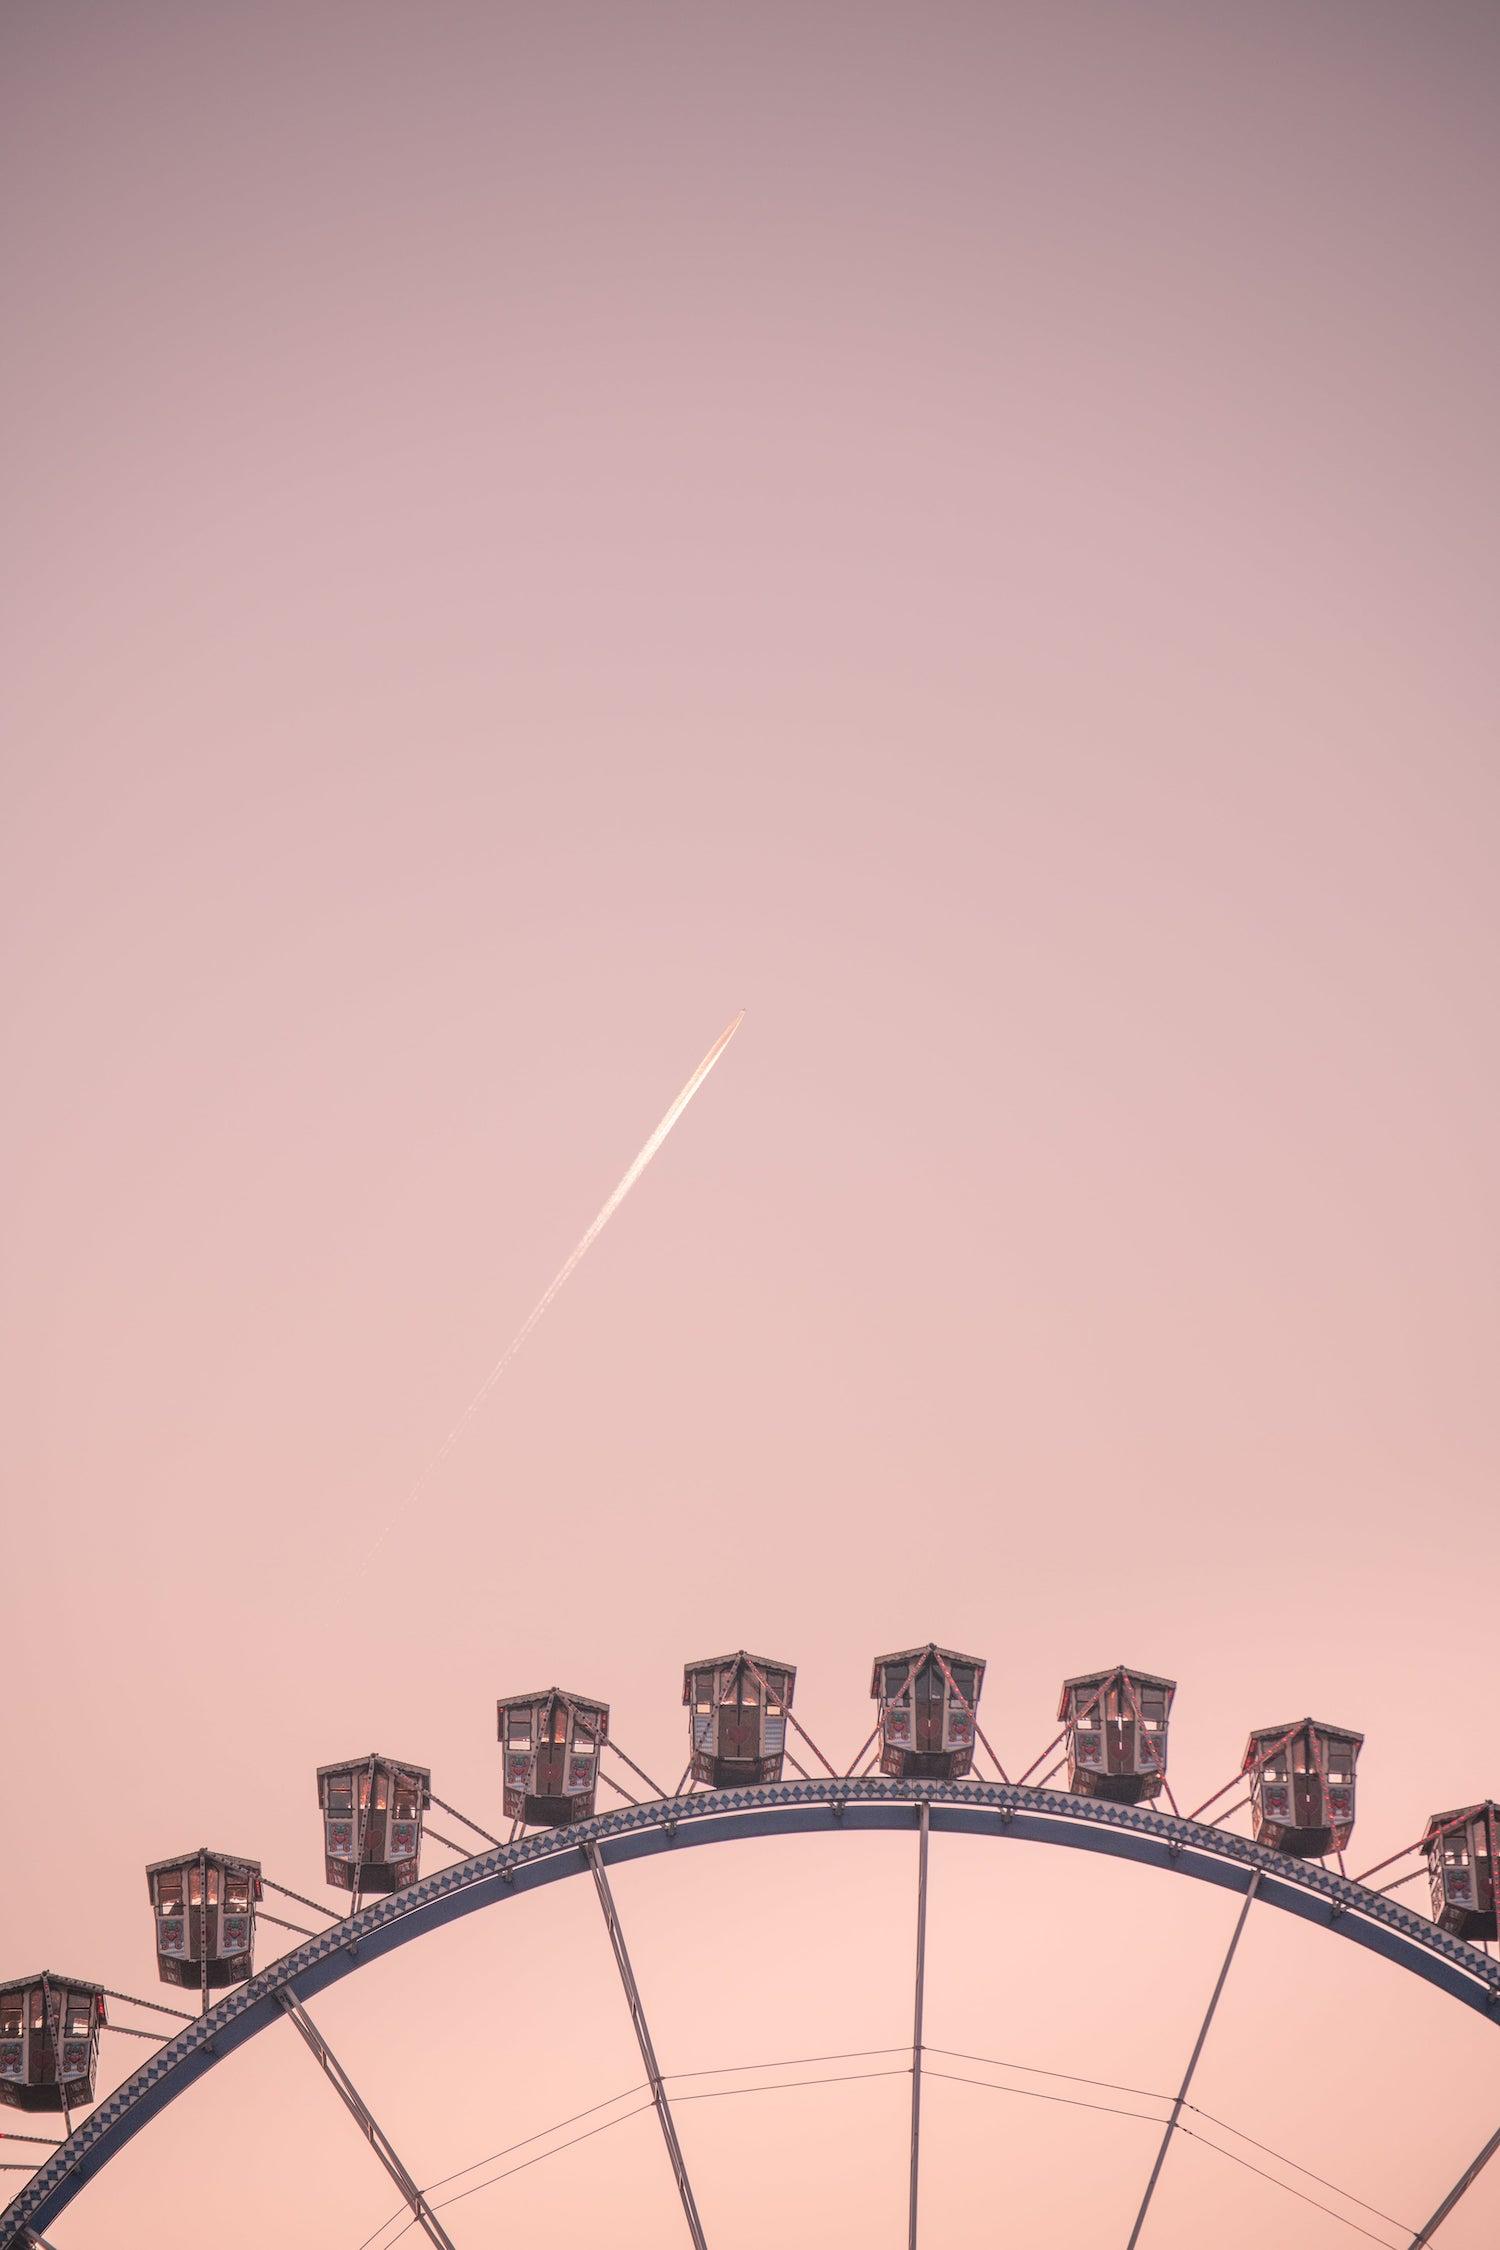 Fair Ferris Wheel, sunset in Berlin